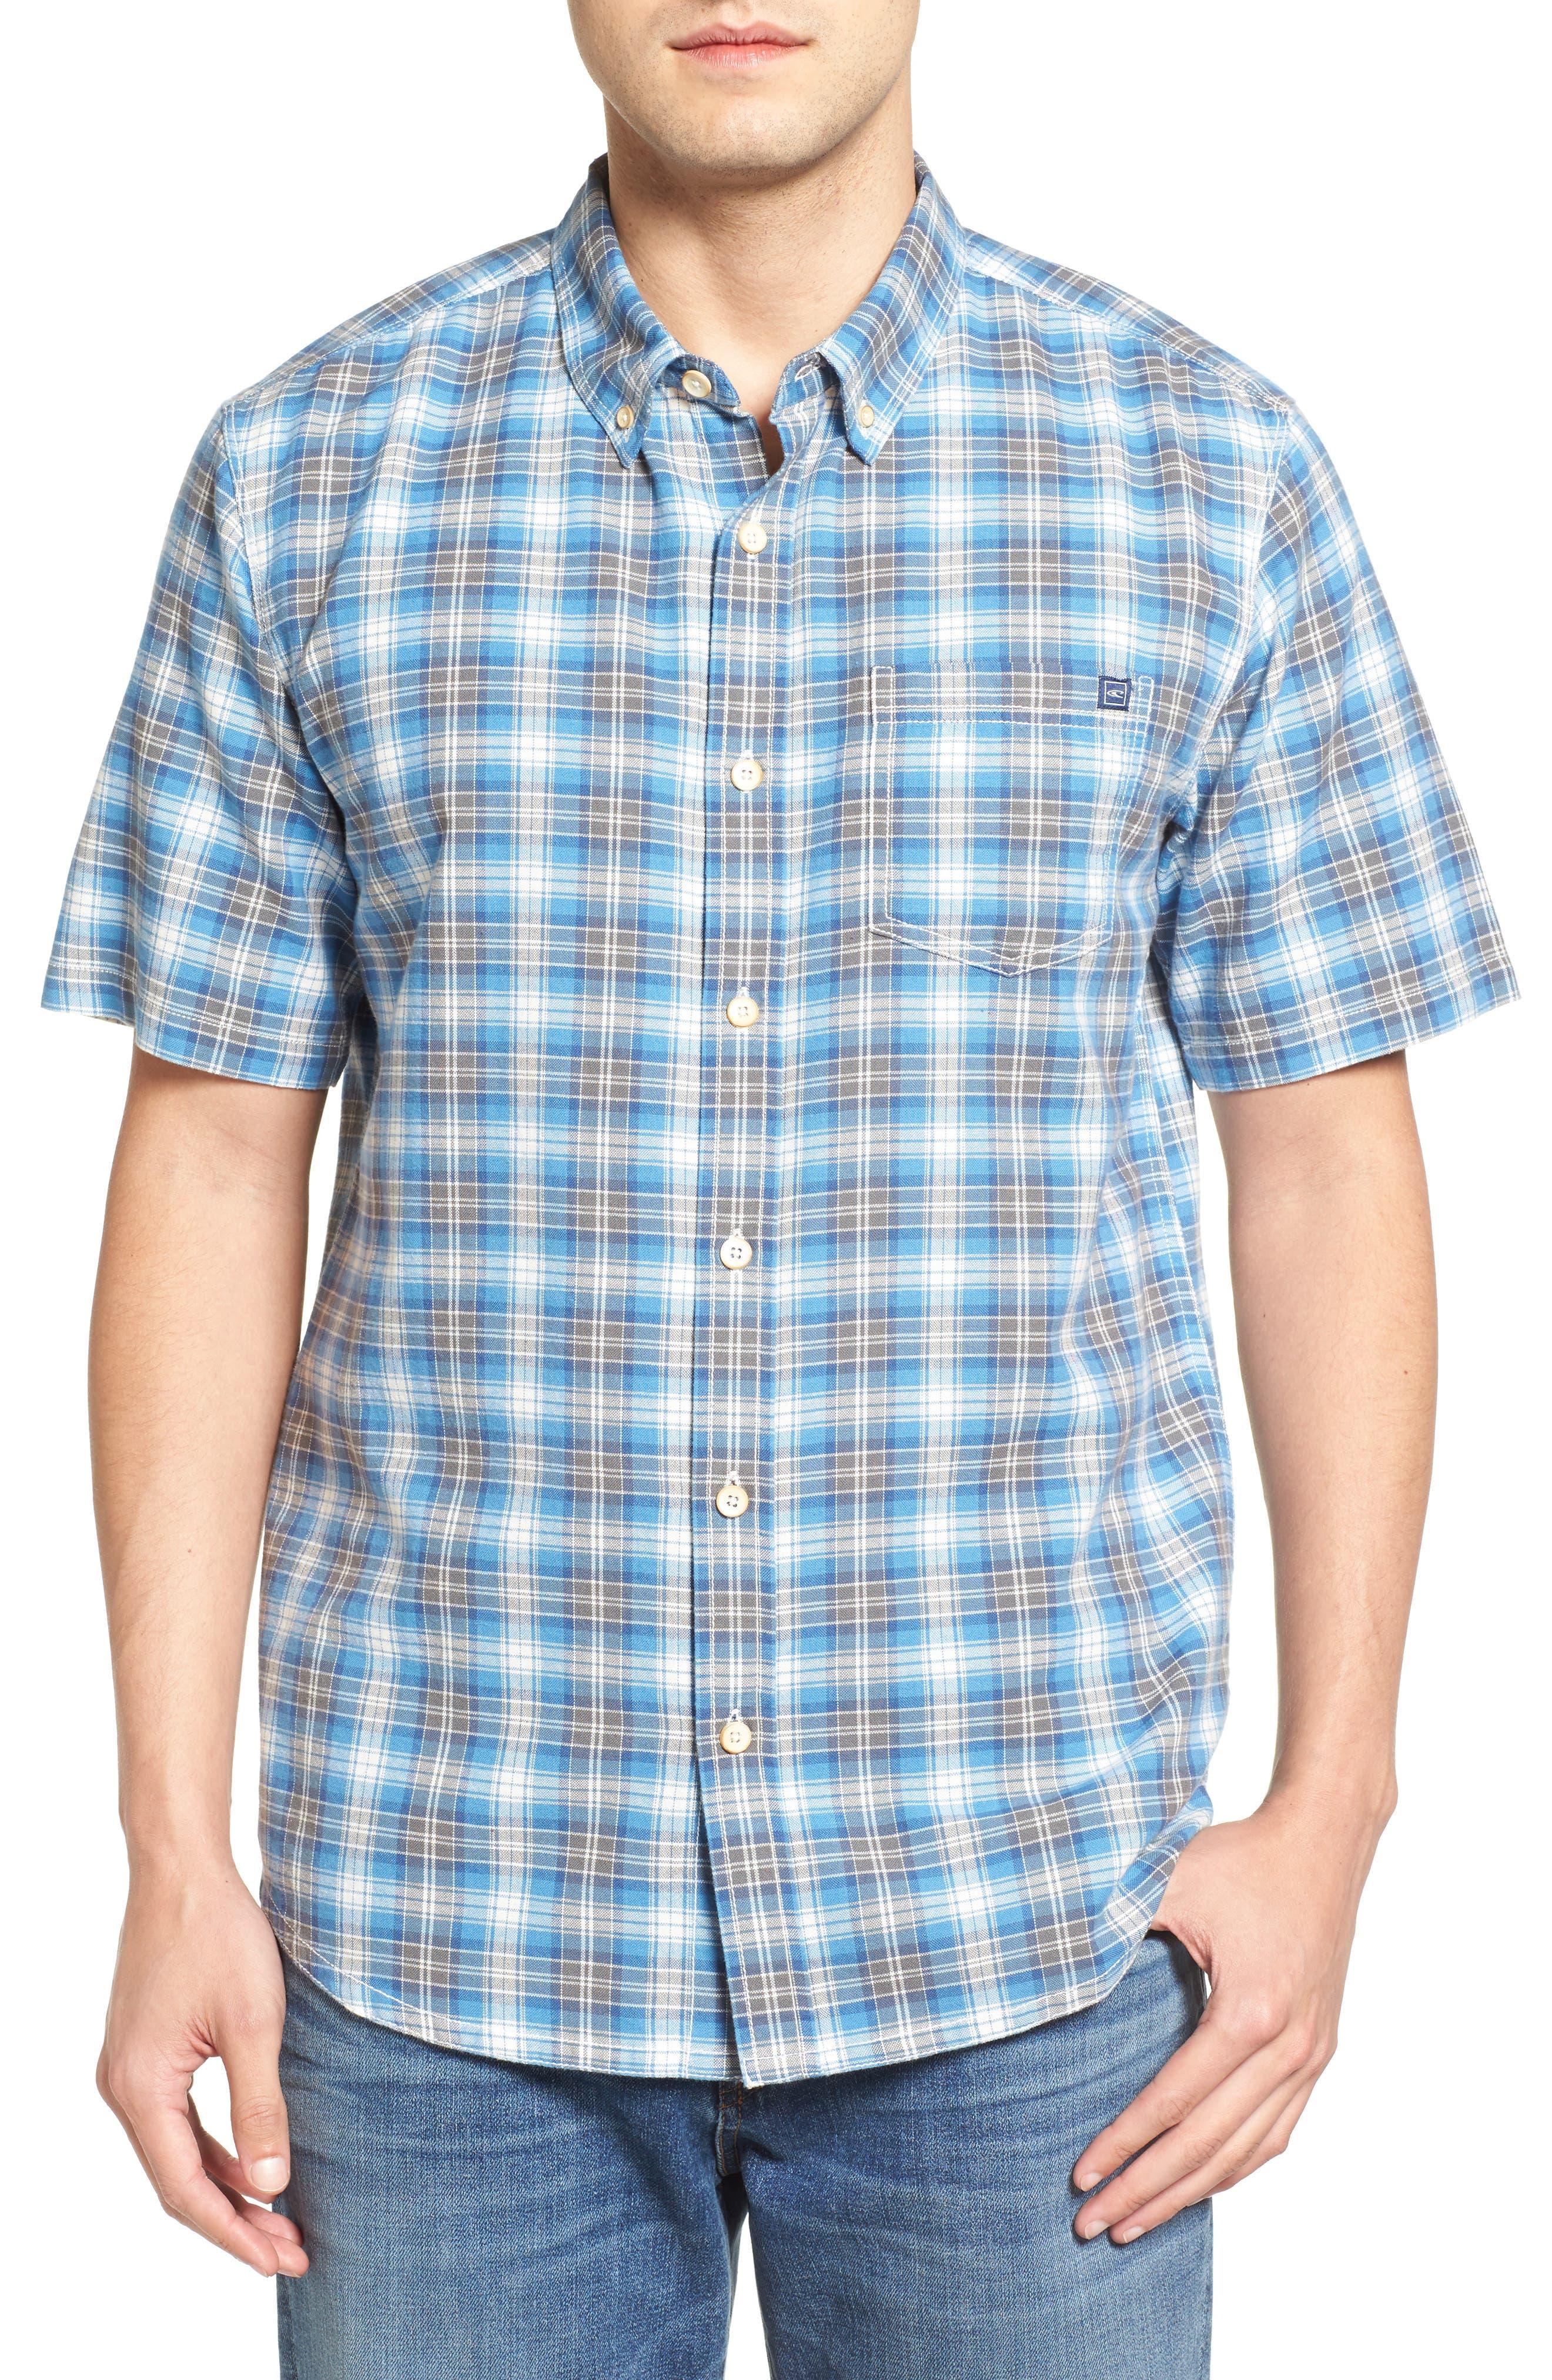 Jack O'Neill Voyager Plaid Sport Shirt